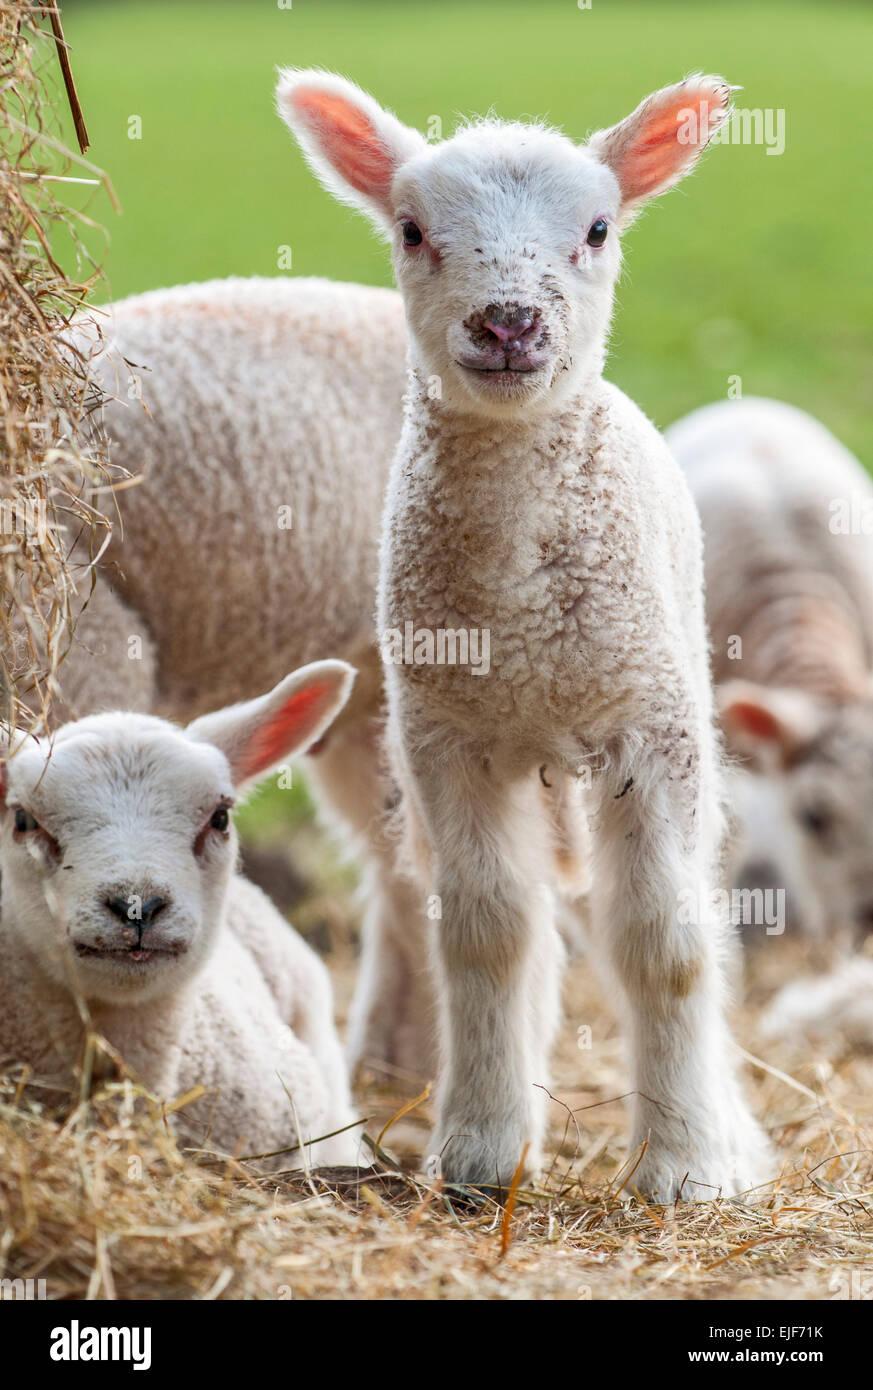 Spring Lambs - Stock Image